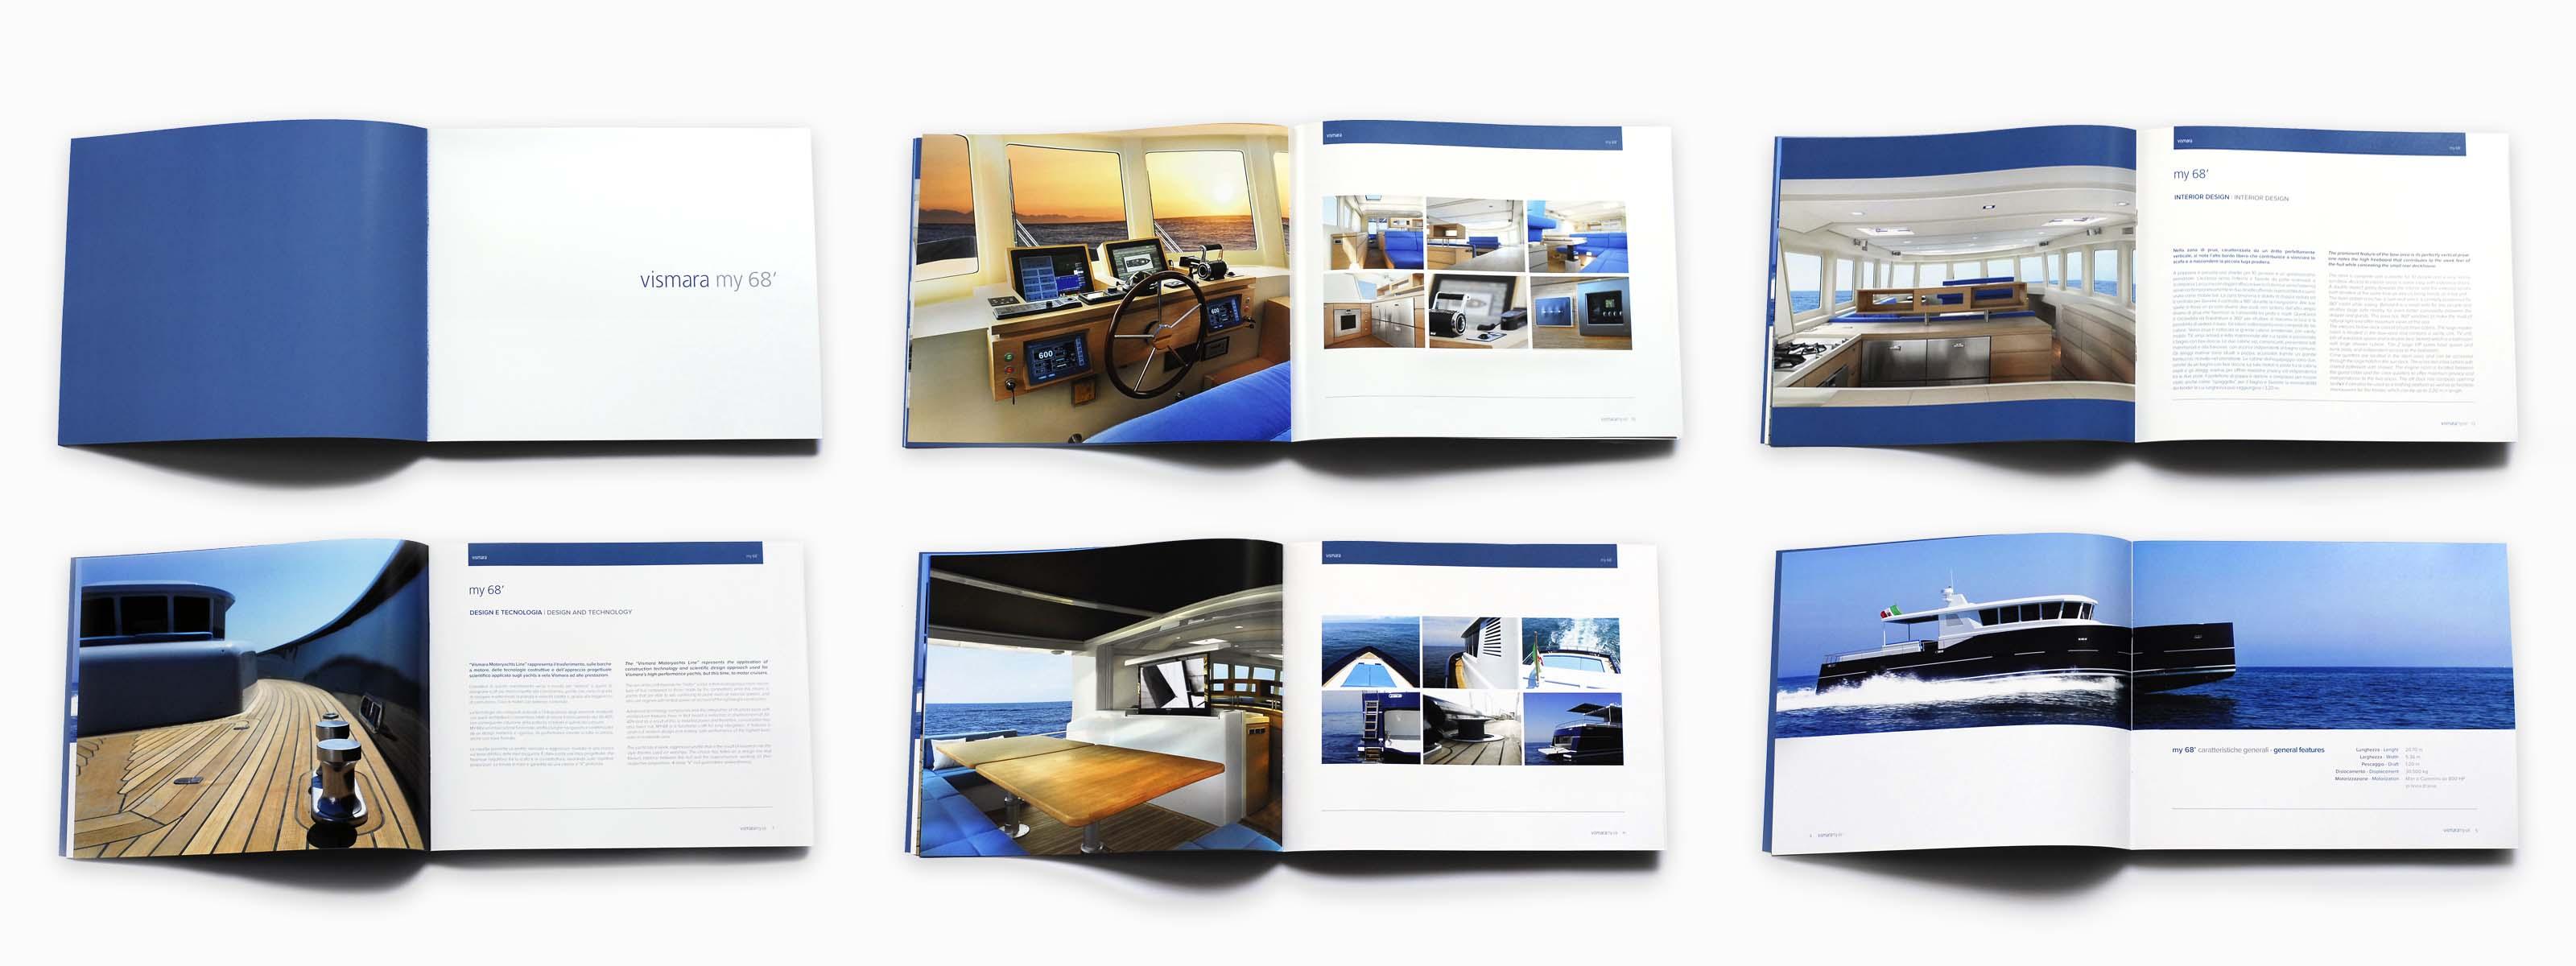 Vismara yacht brochure my68